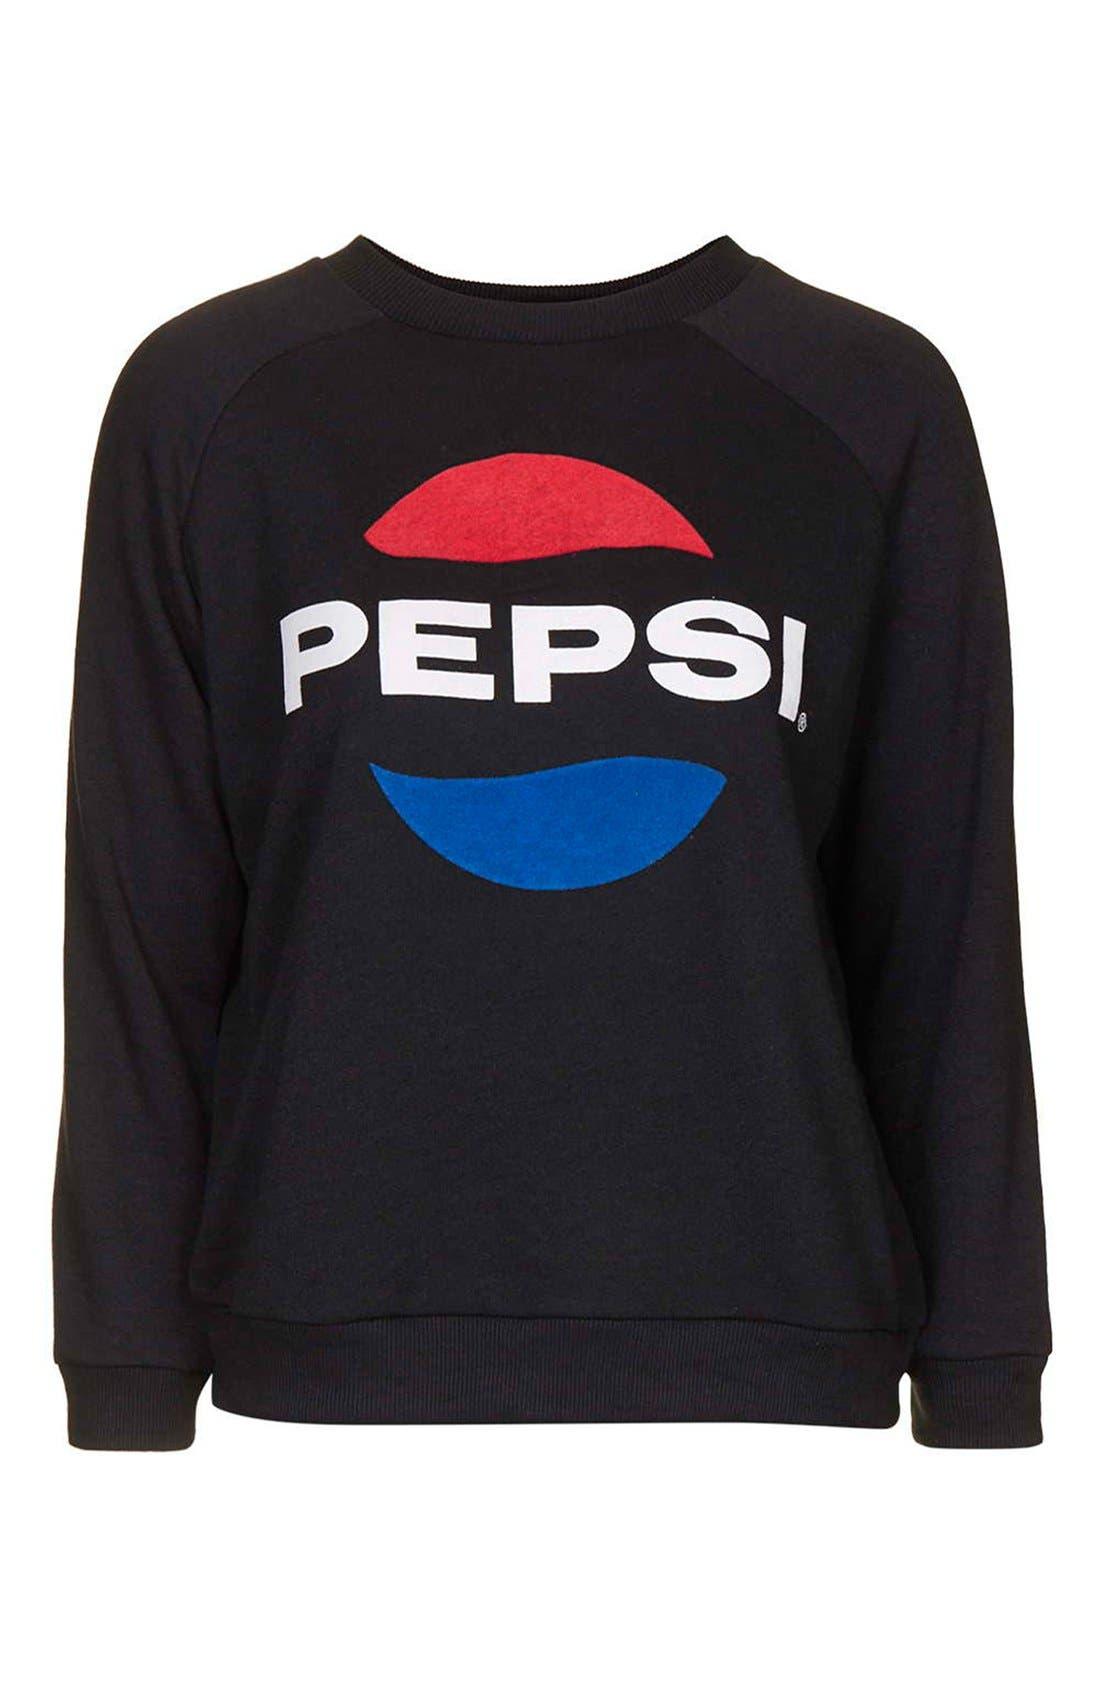 Alternate Image 3  - Topshop Tee and Cake 'Pepsi' Sweatshirt (Petite)